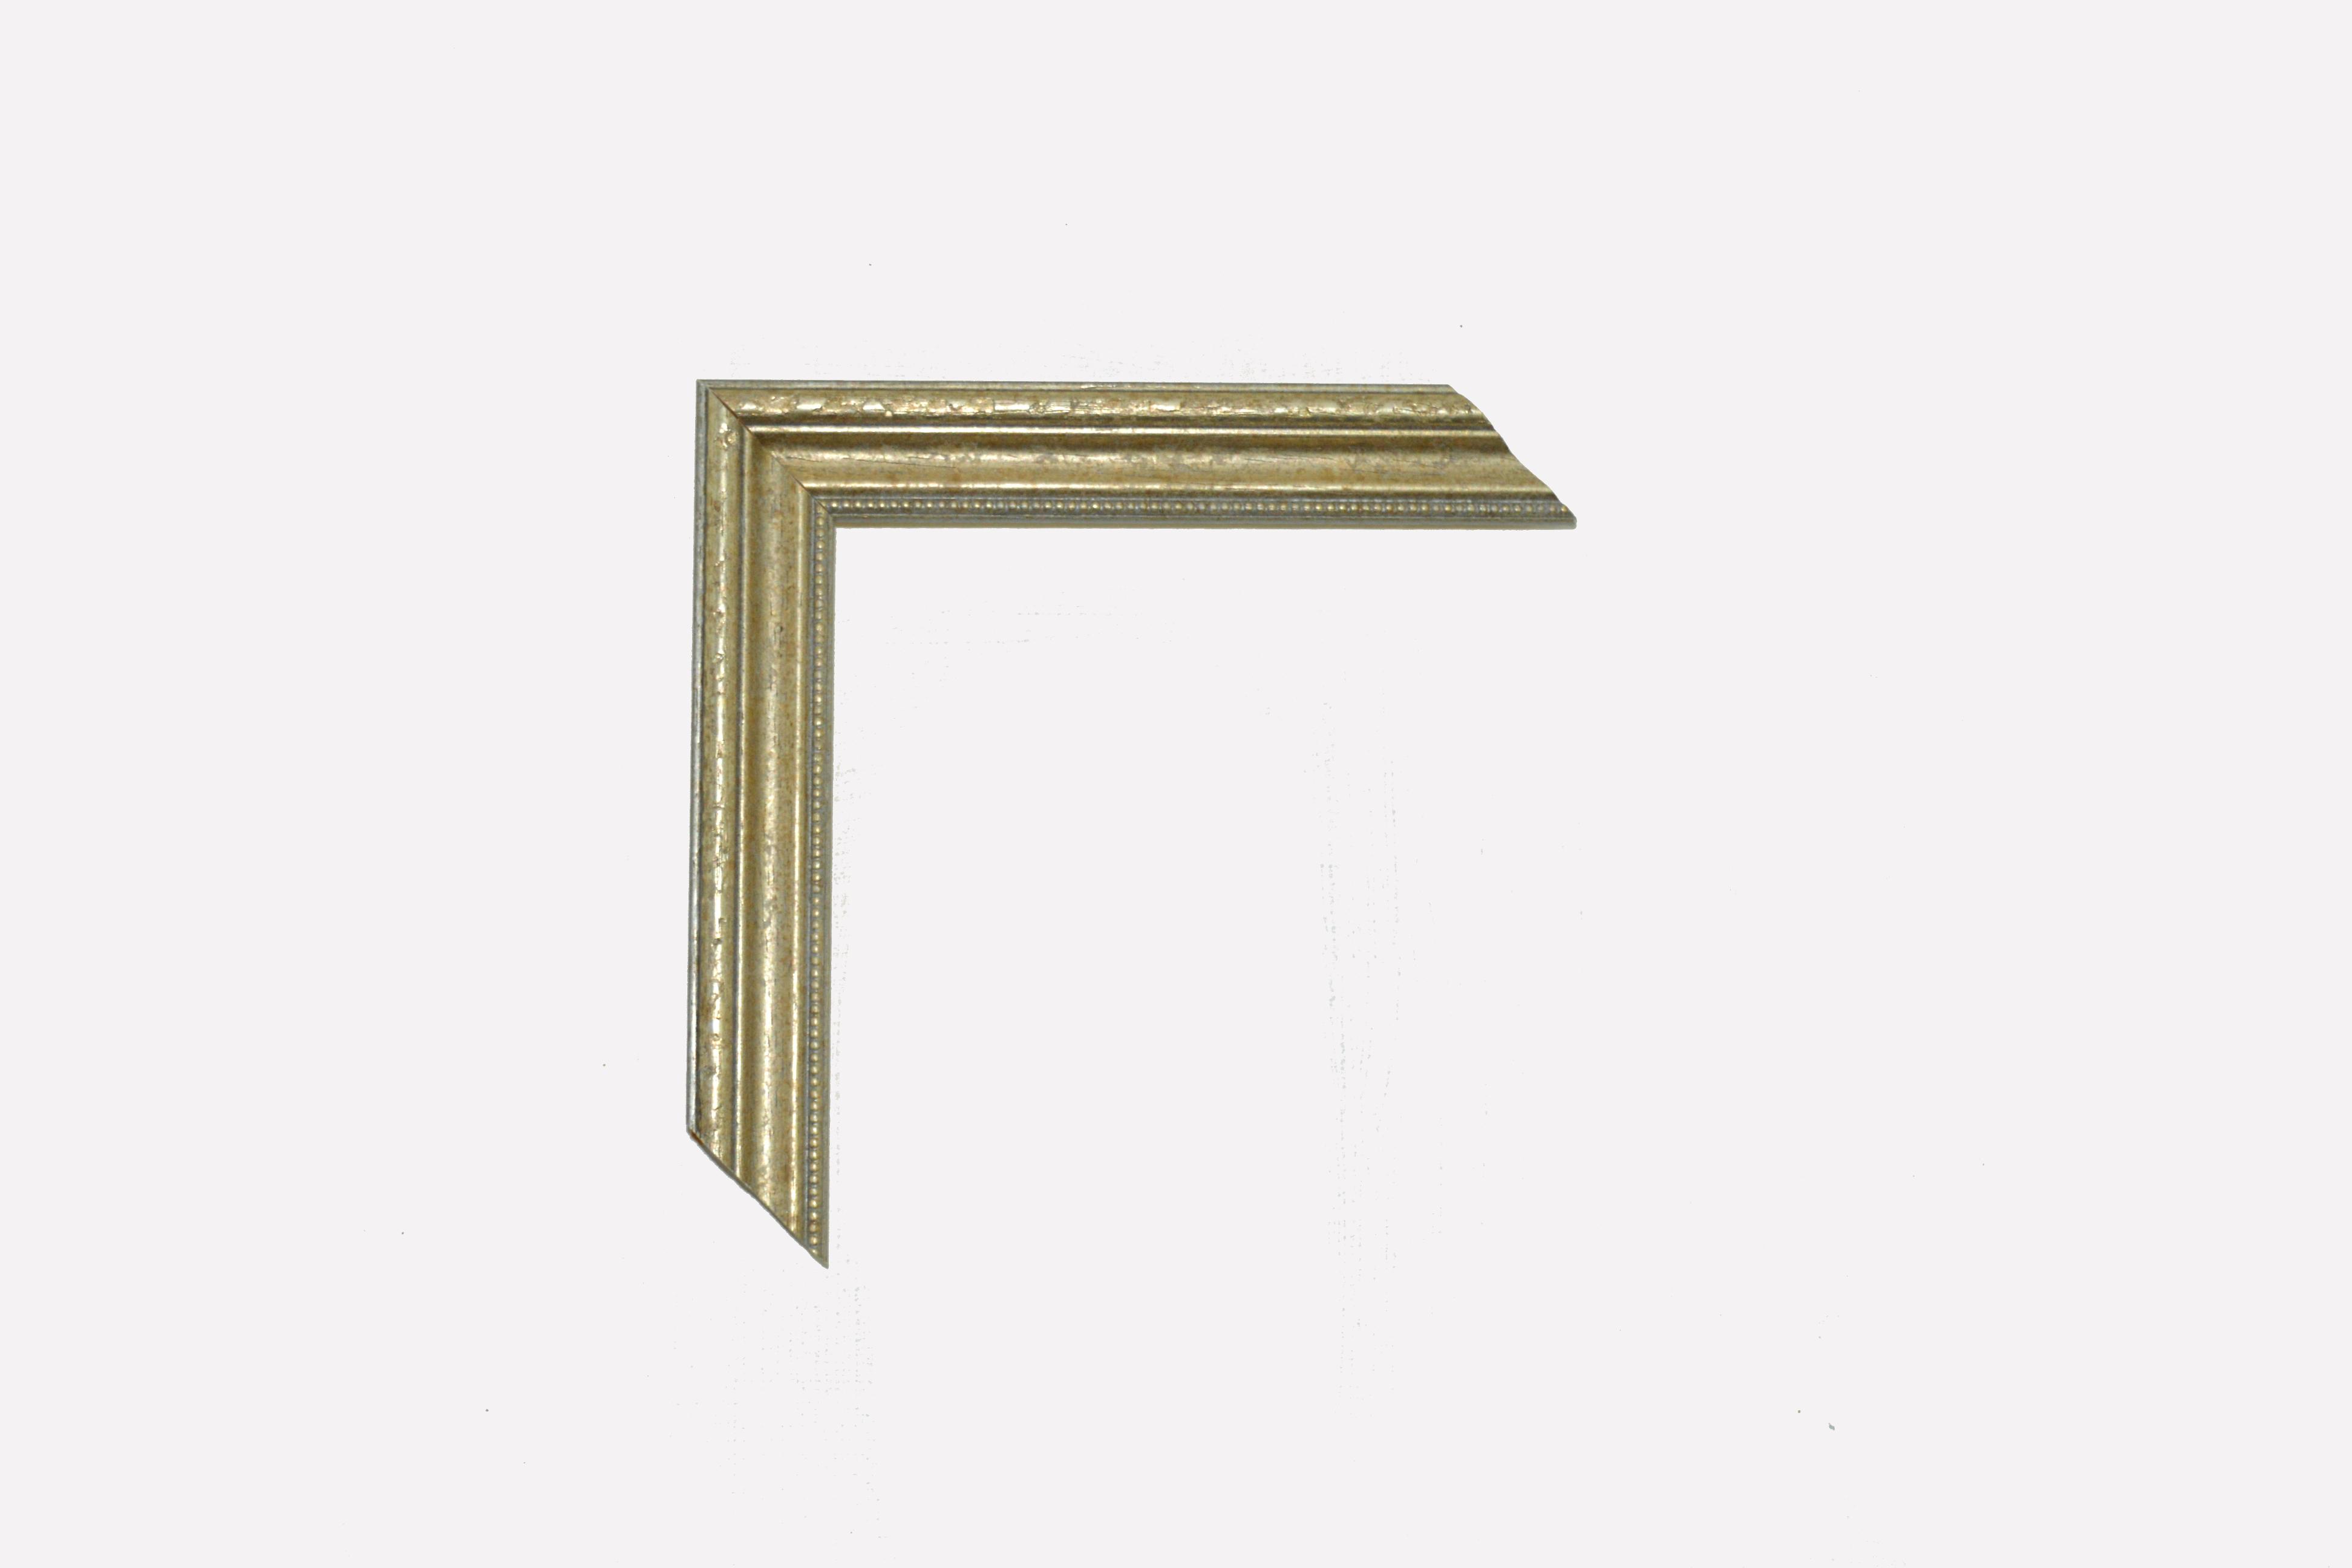 02121-PLATA-ancho2,9cm